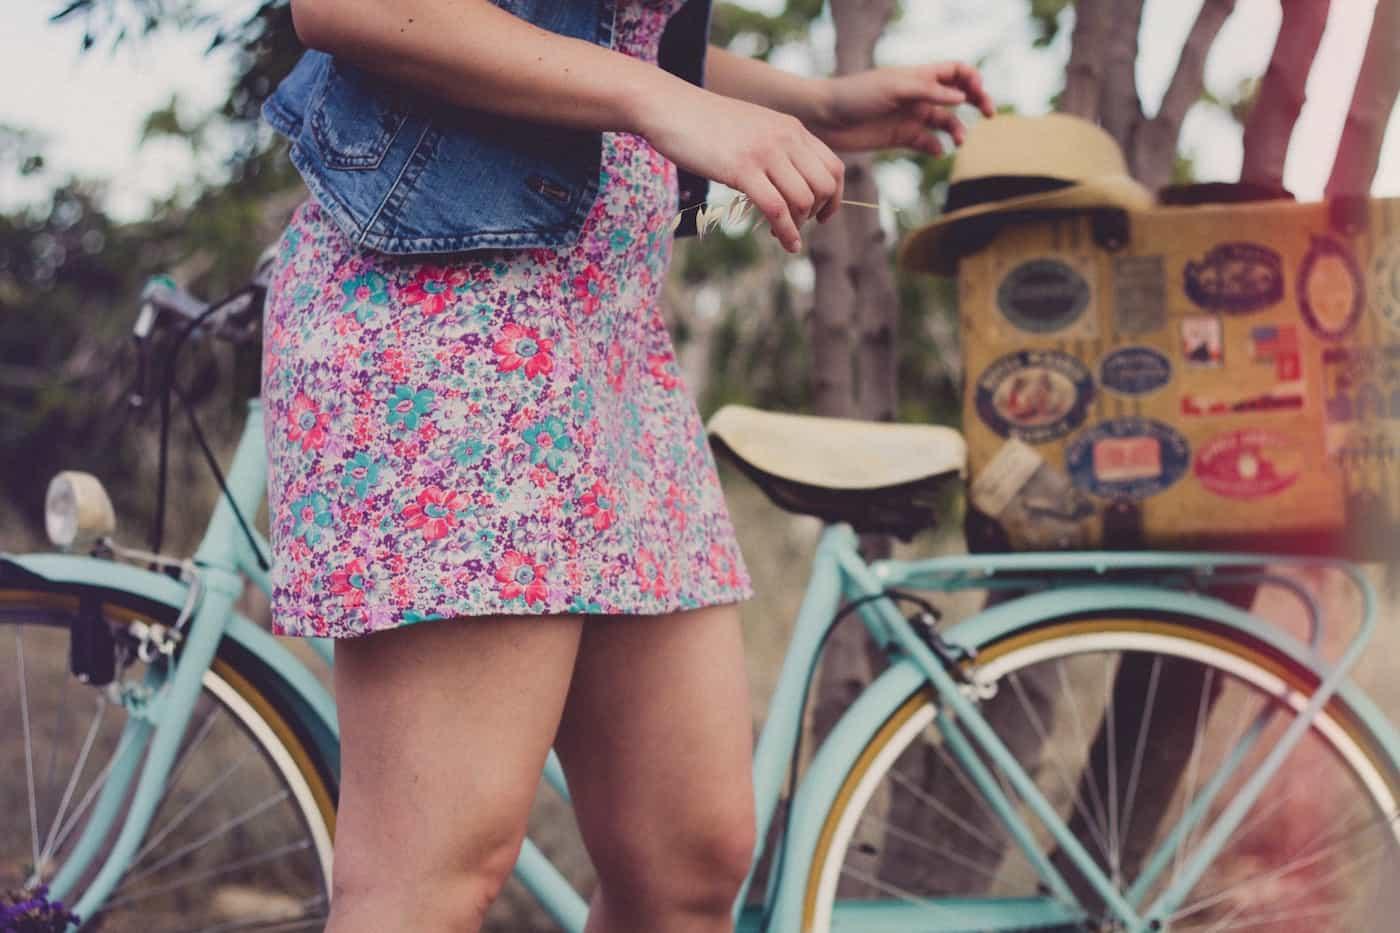 activity6-ladies skirt with bike